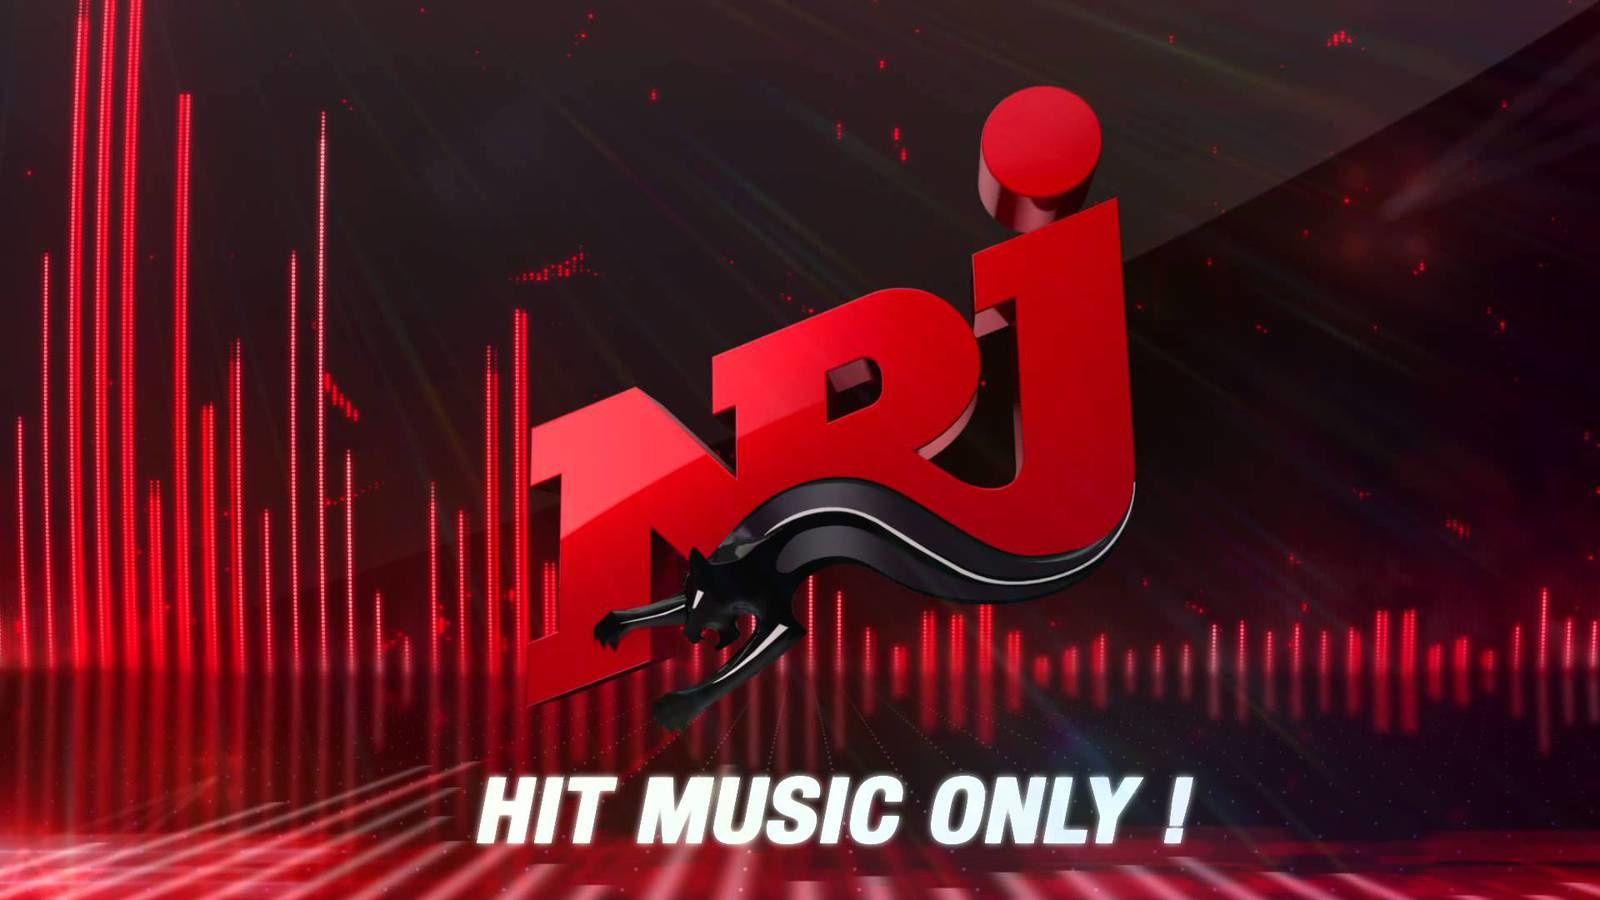 Audiences Radio : NRJ devant RTL, Europe 1 en forte baisse